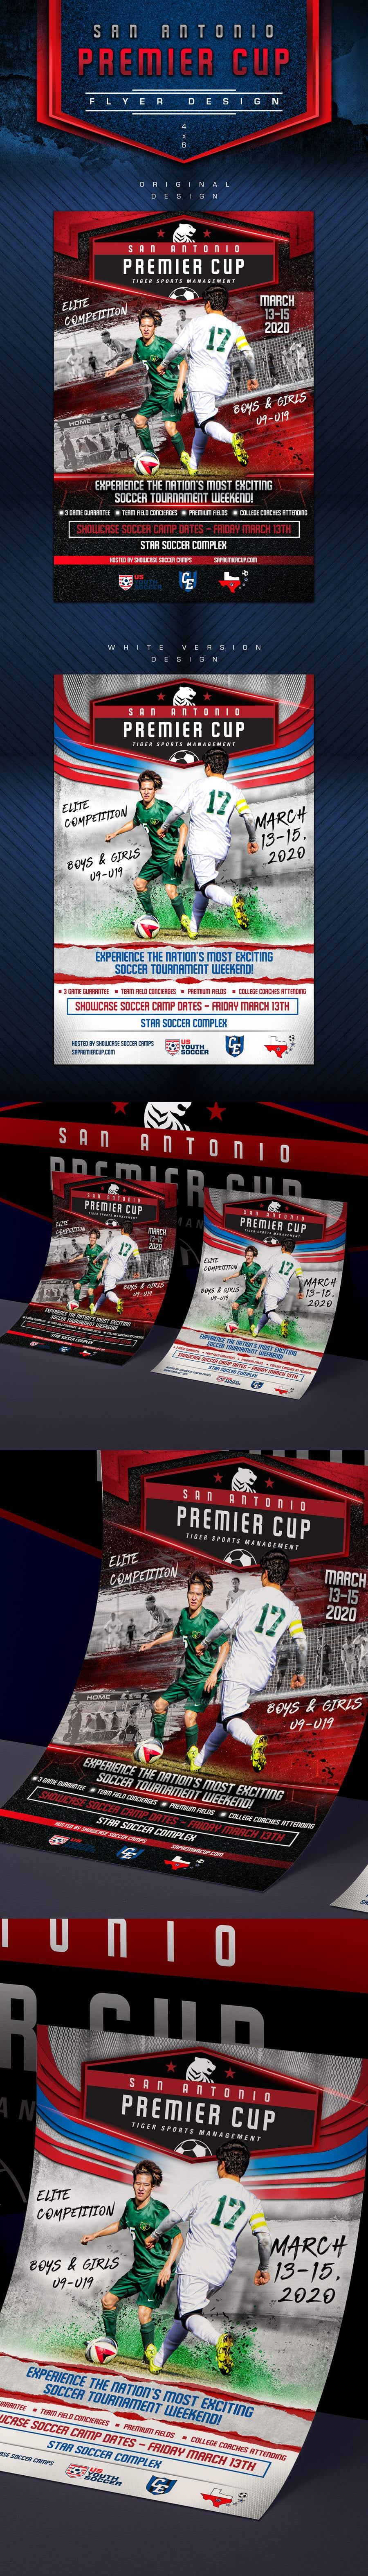 Penyertaan Peraduan #59 untuk Looking to have soccer tournament flyers done